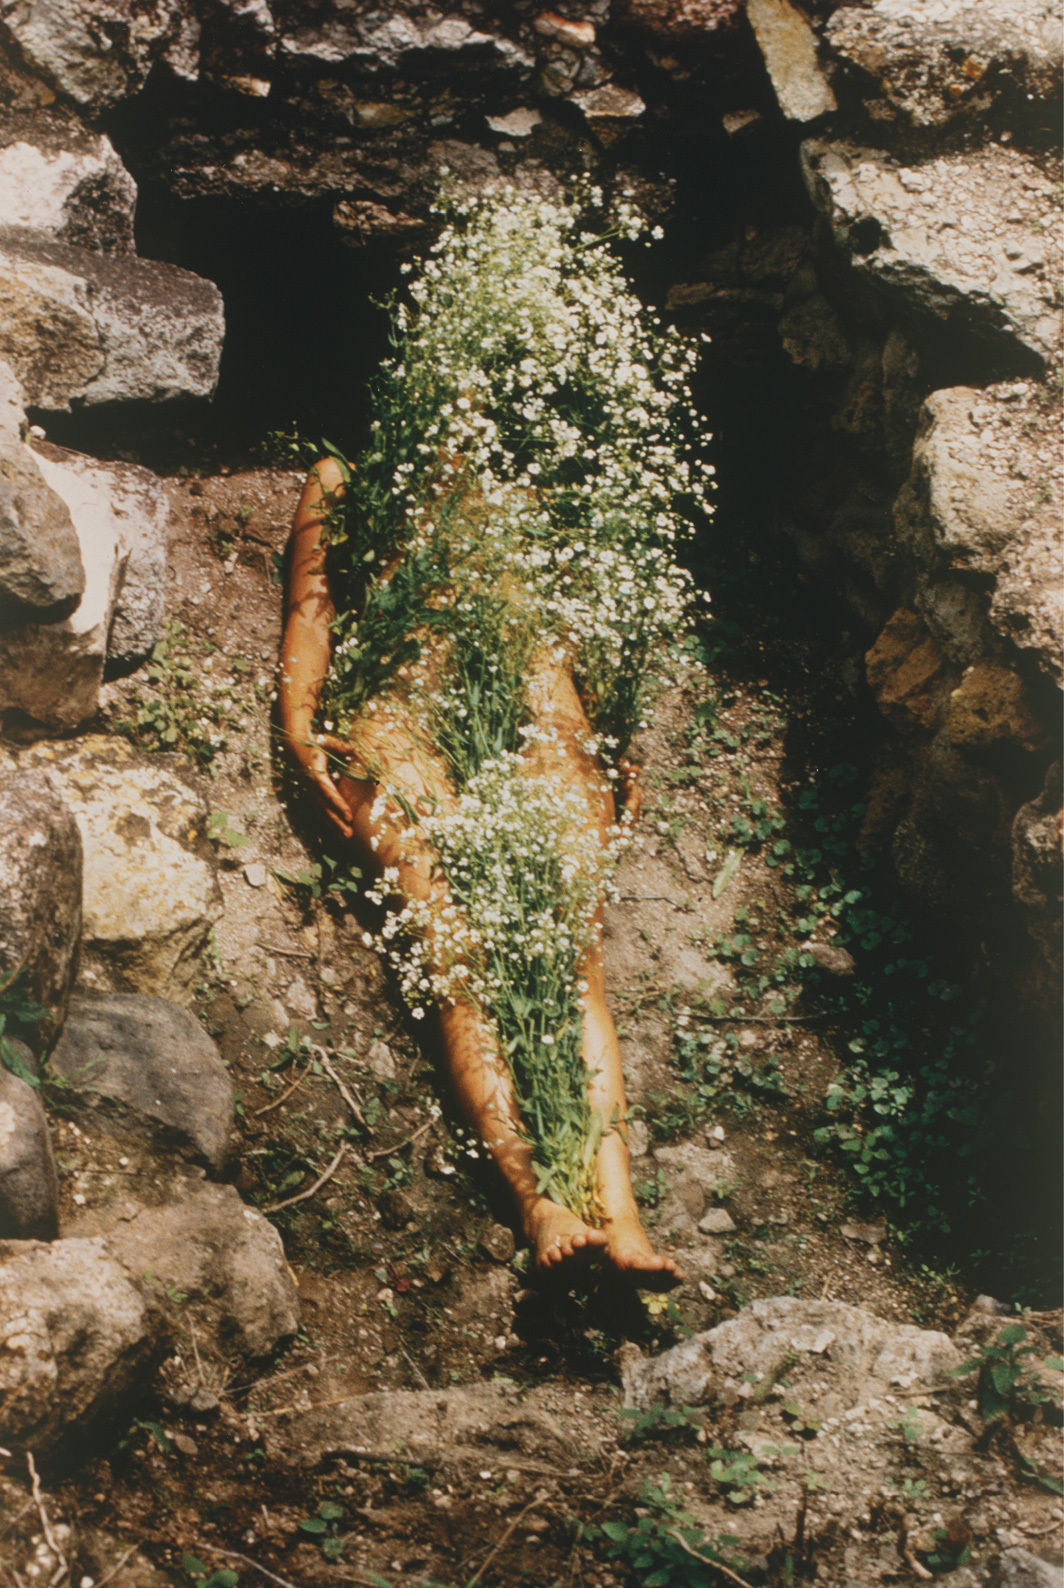 *Ana Mendieta, _Untitled: Silueta Series, Mexico From Silueta Works in Mexico, 1973–1977_, 1973, *C-print, 20 × 16